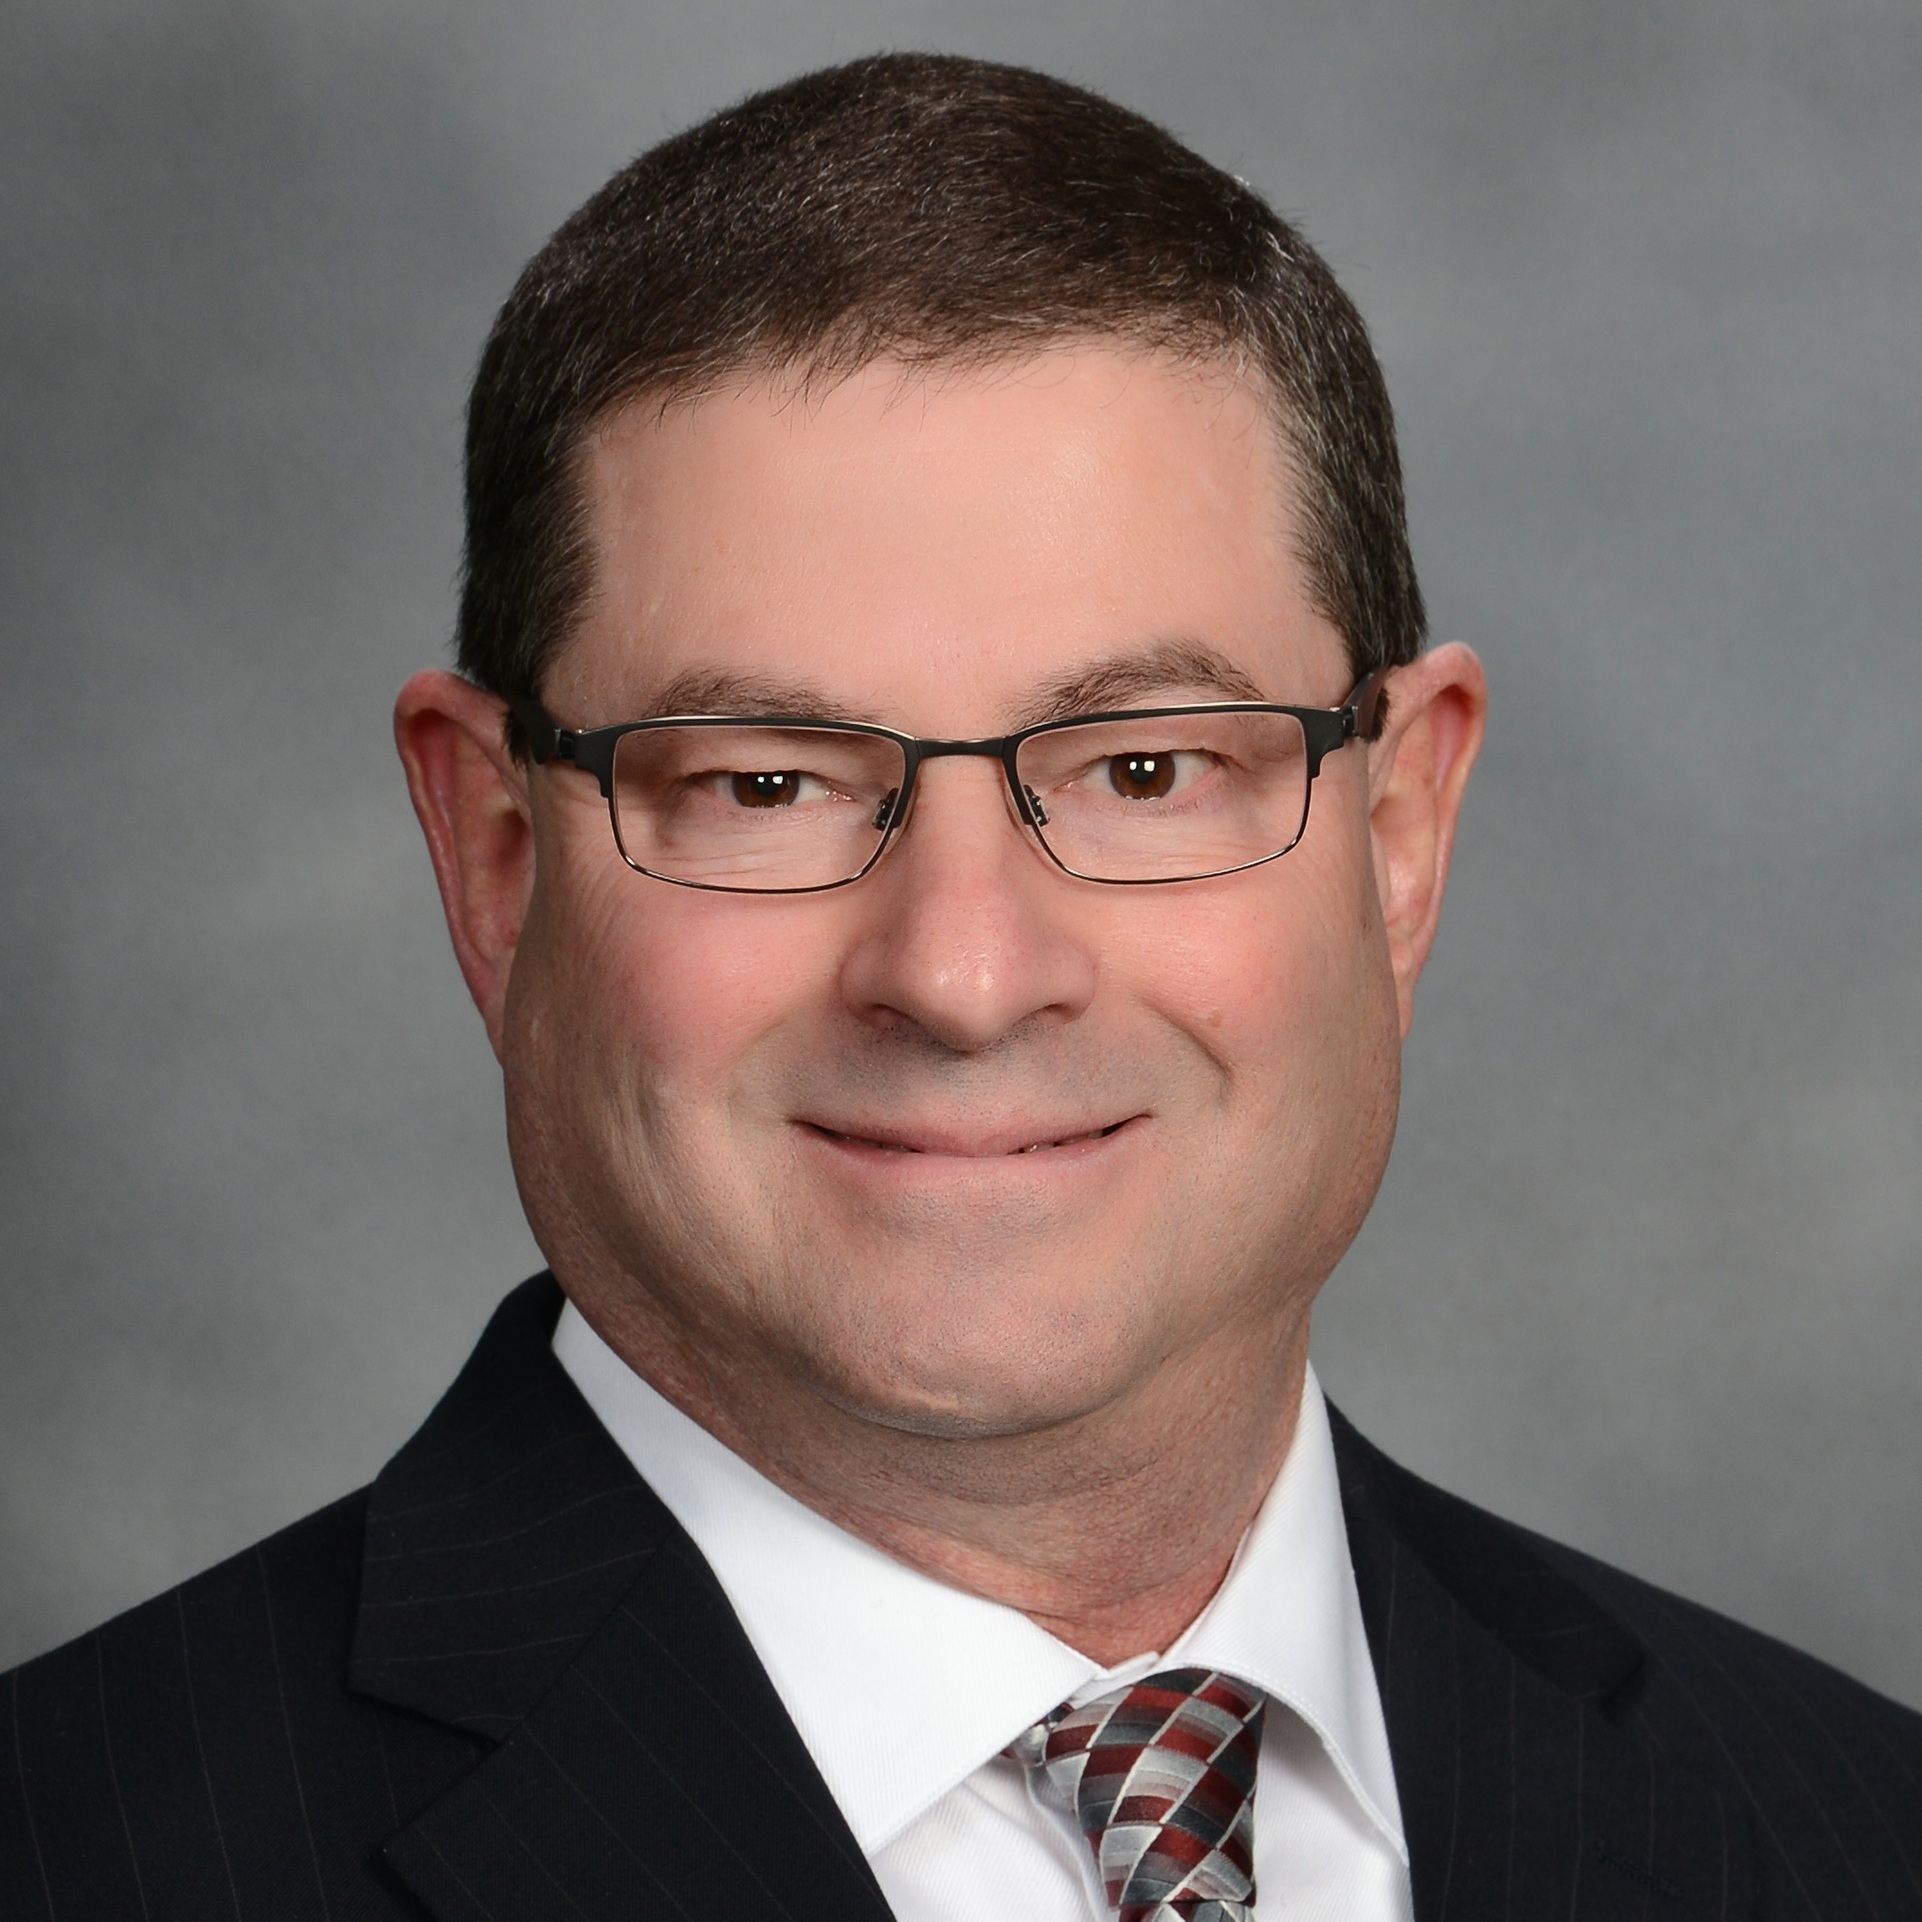 - Scott DemczyszynVice President of Operations